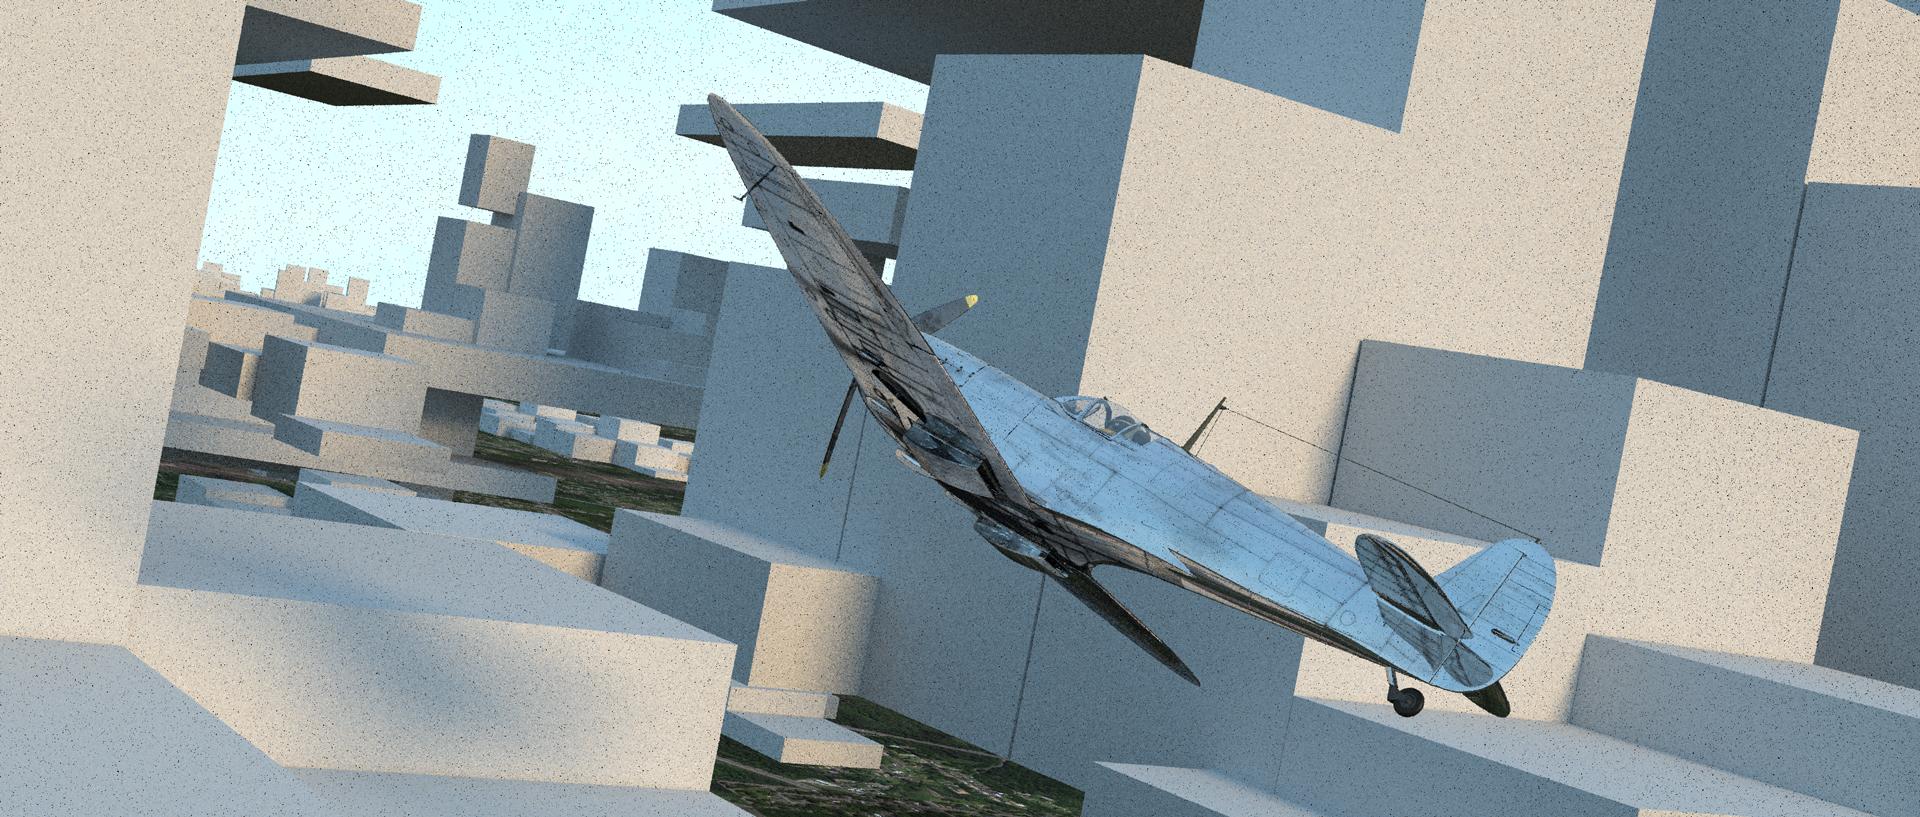 styleframe3_layout